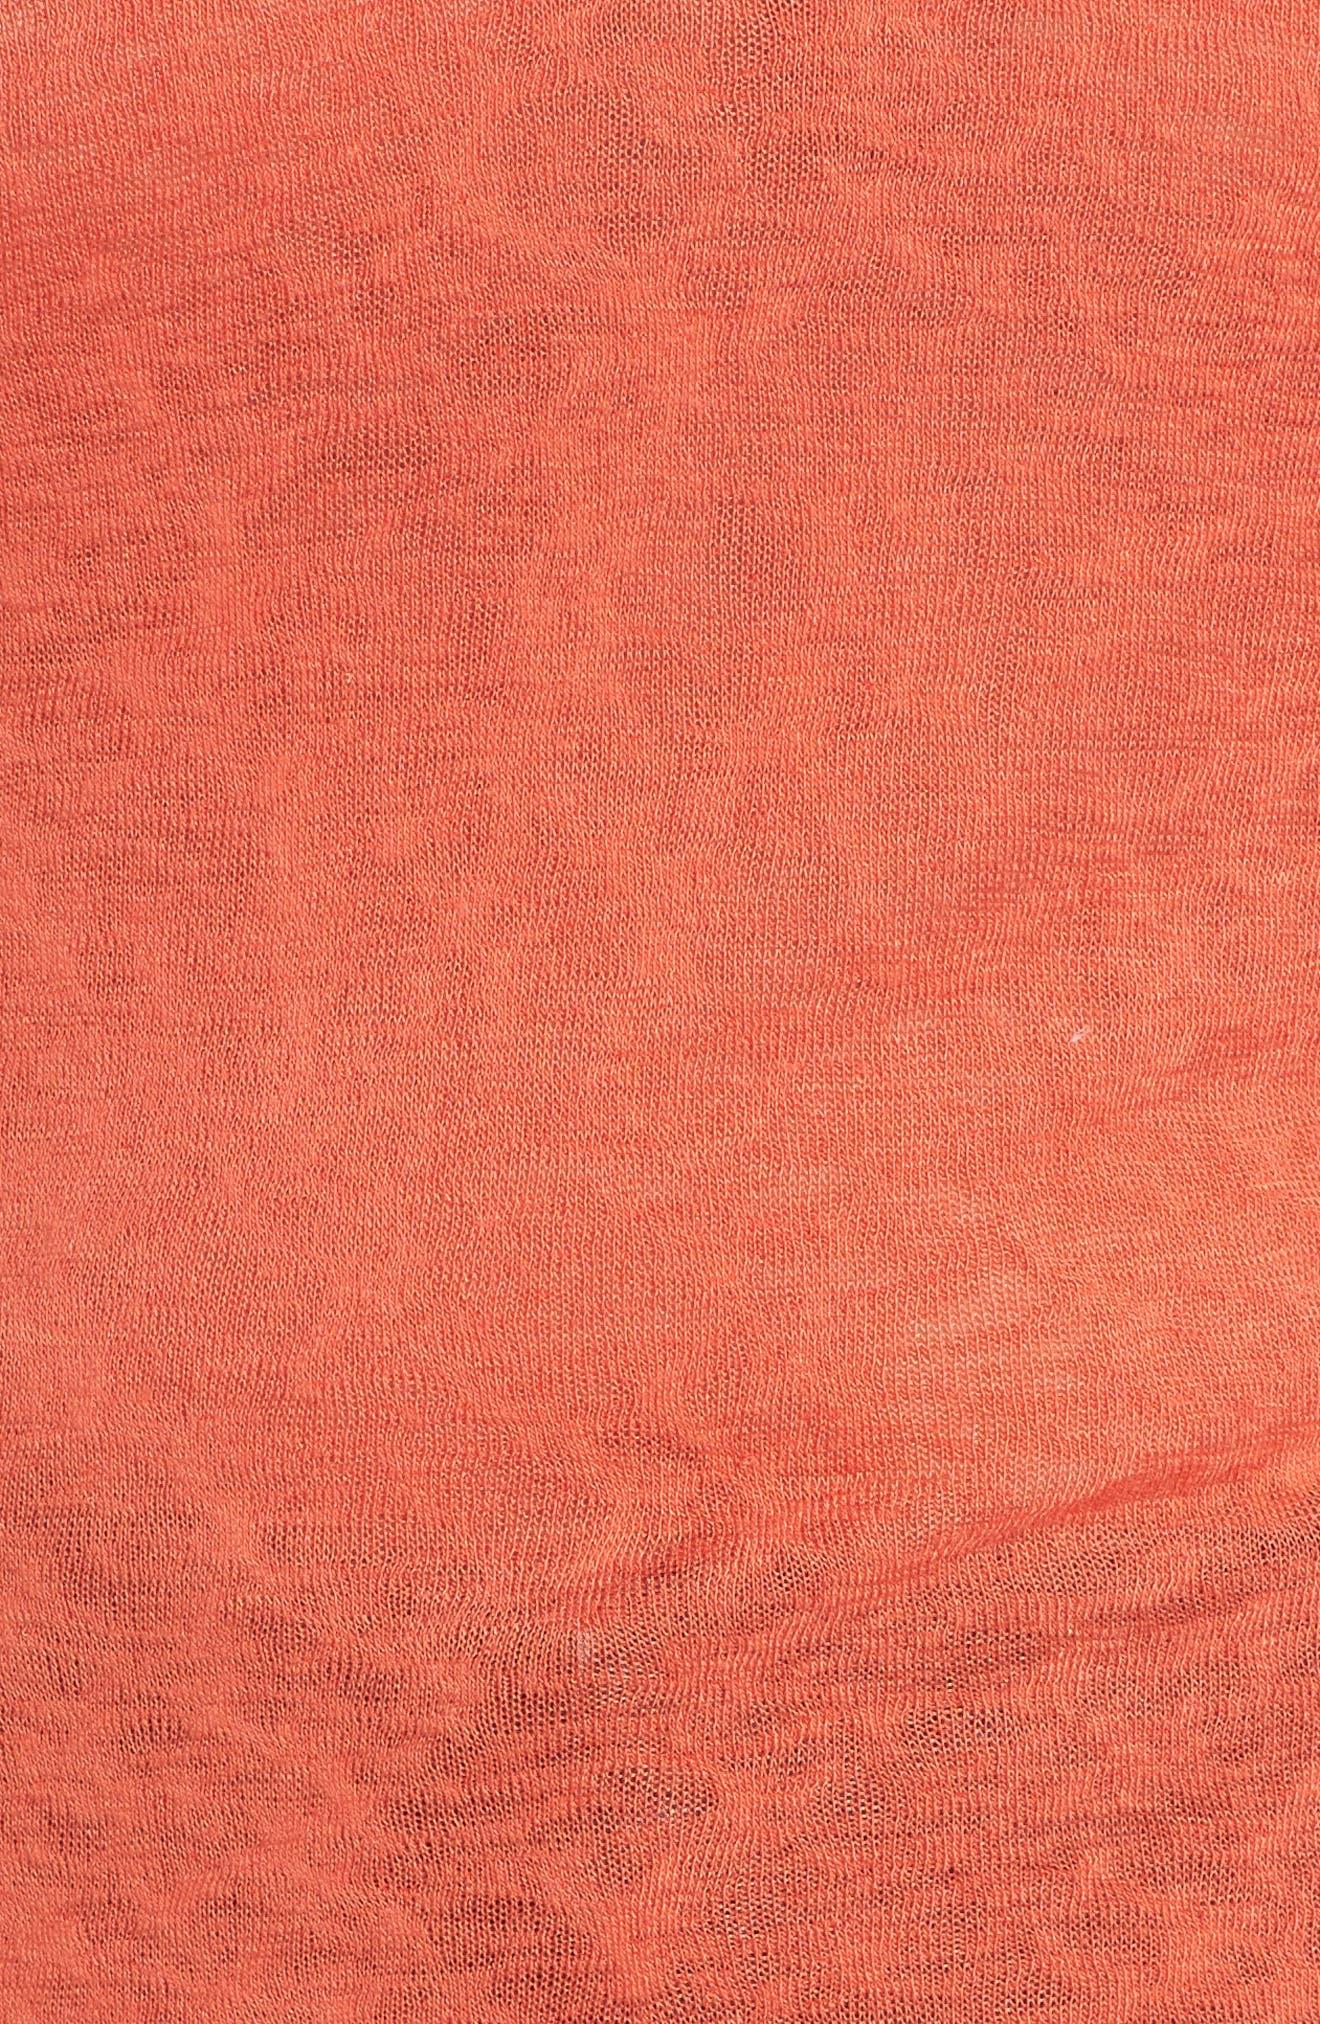 Tassel Trim Slub Knit Top,                             Alternate thumbnail 5, color,                             800